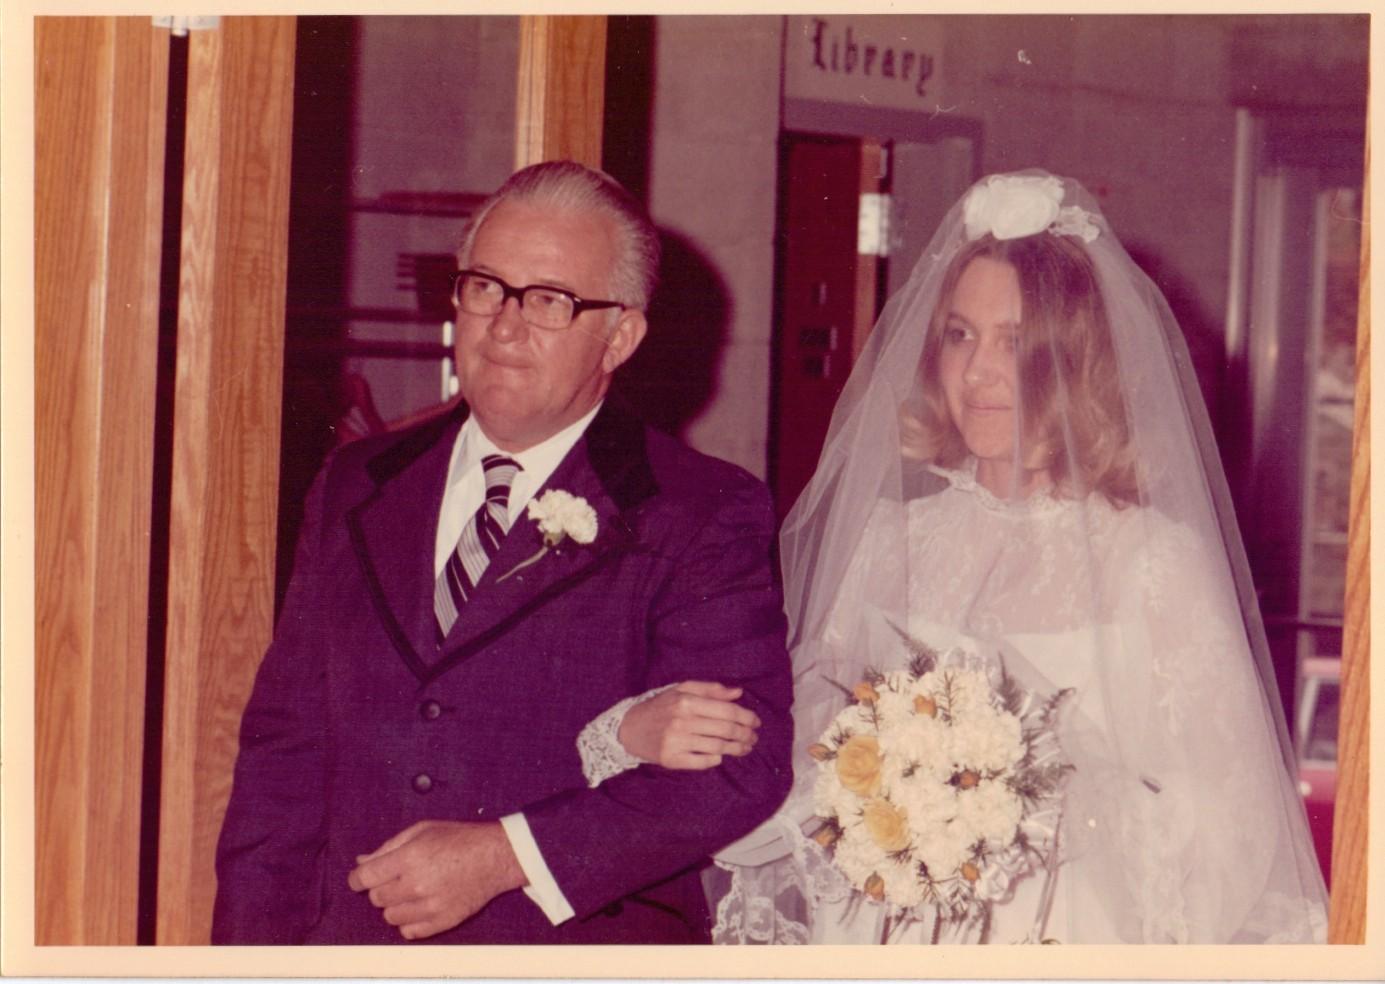 Daddy & me wedding day